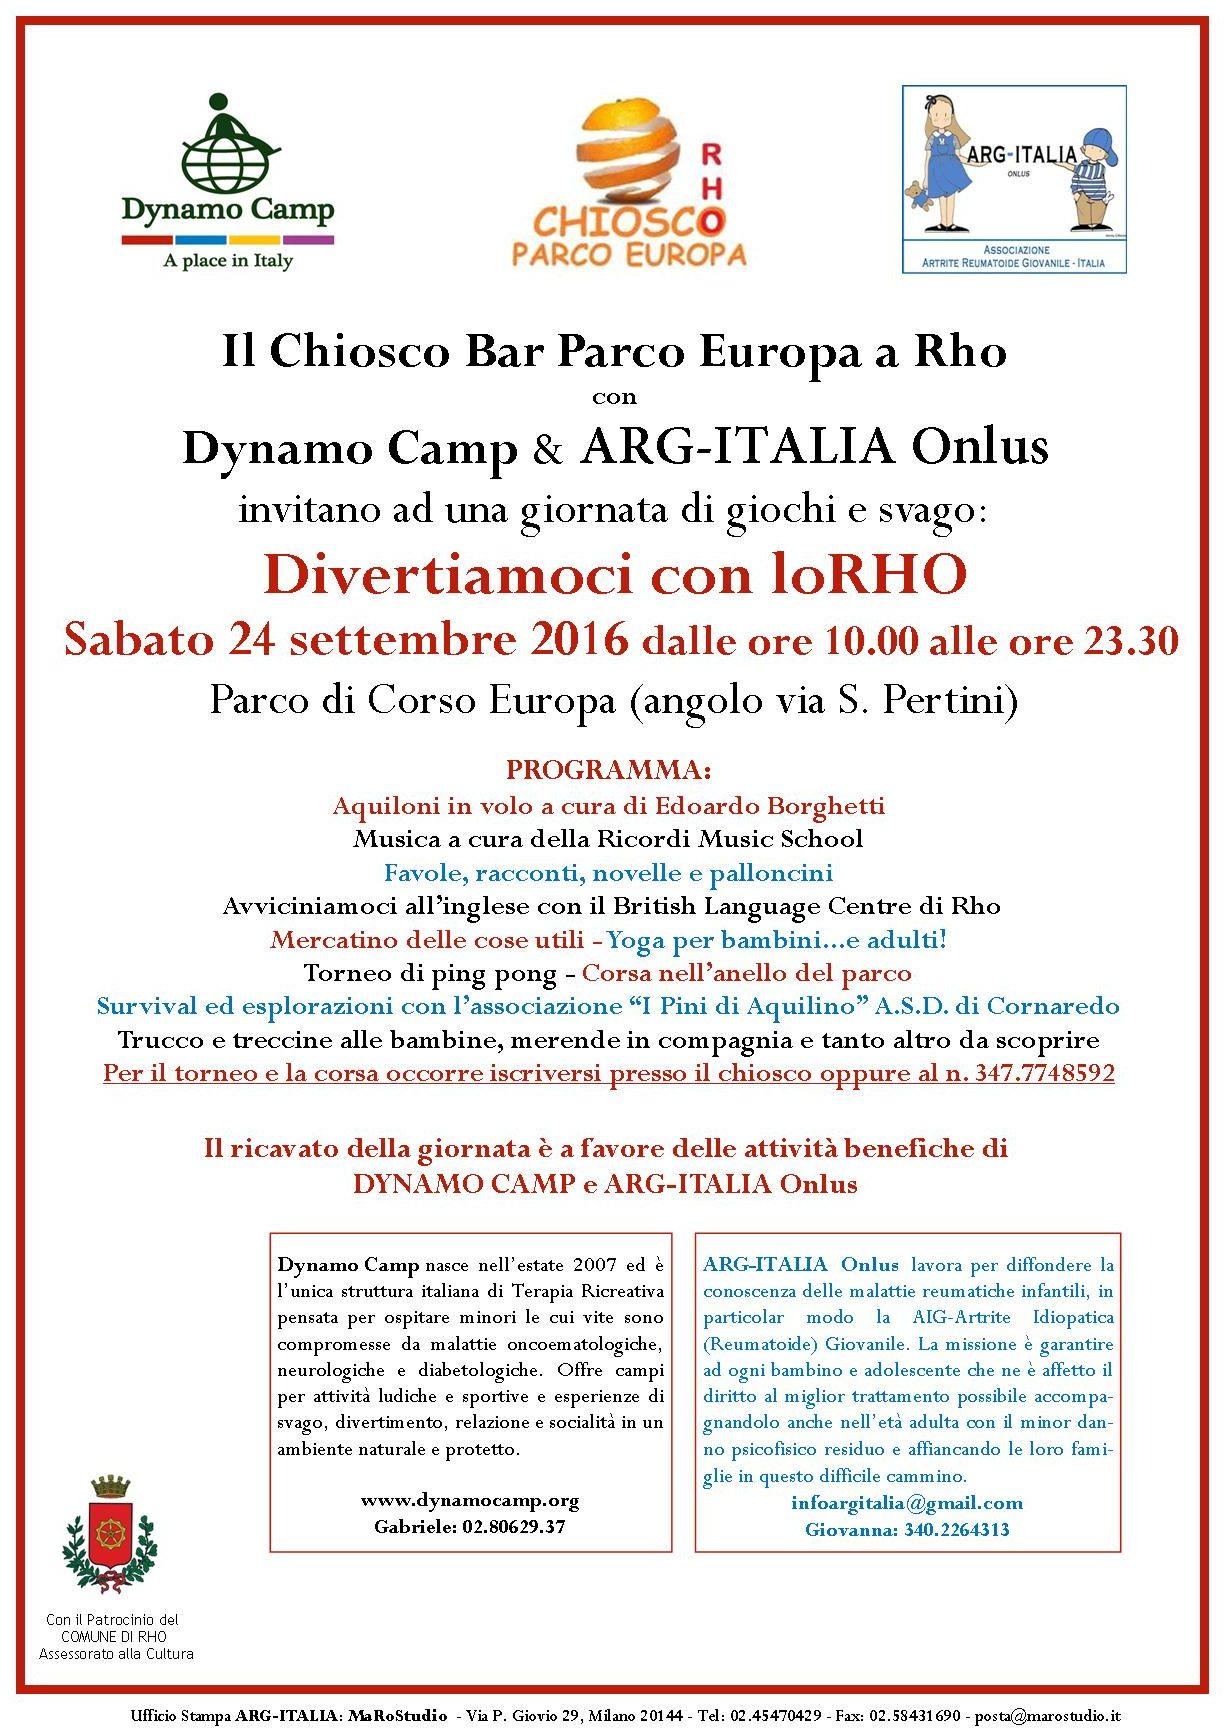 ARG-Italia ONLUS | Divertiamoci con loRho